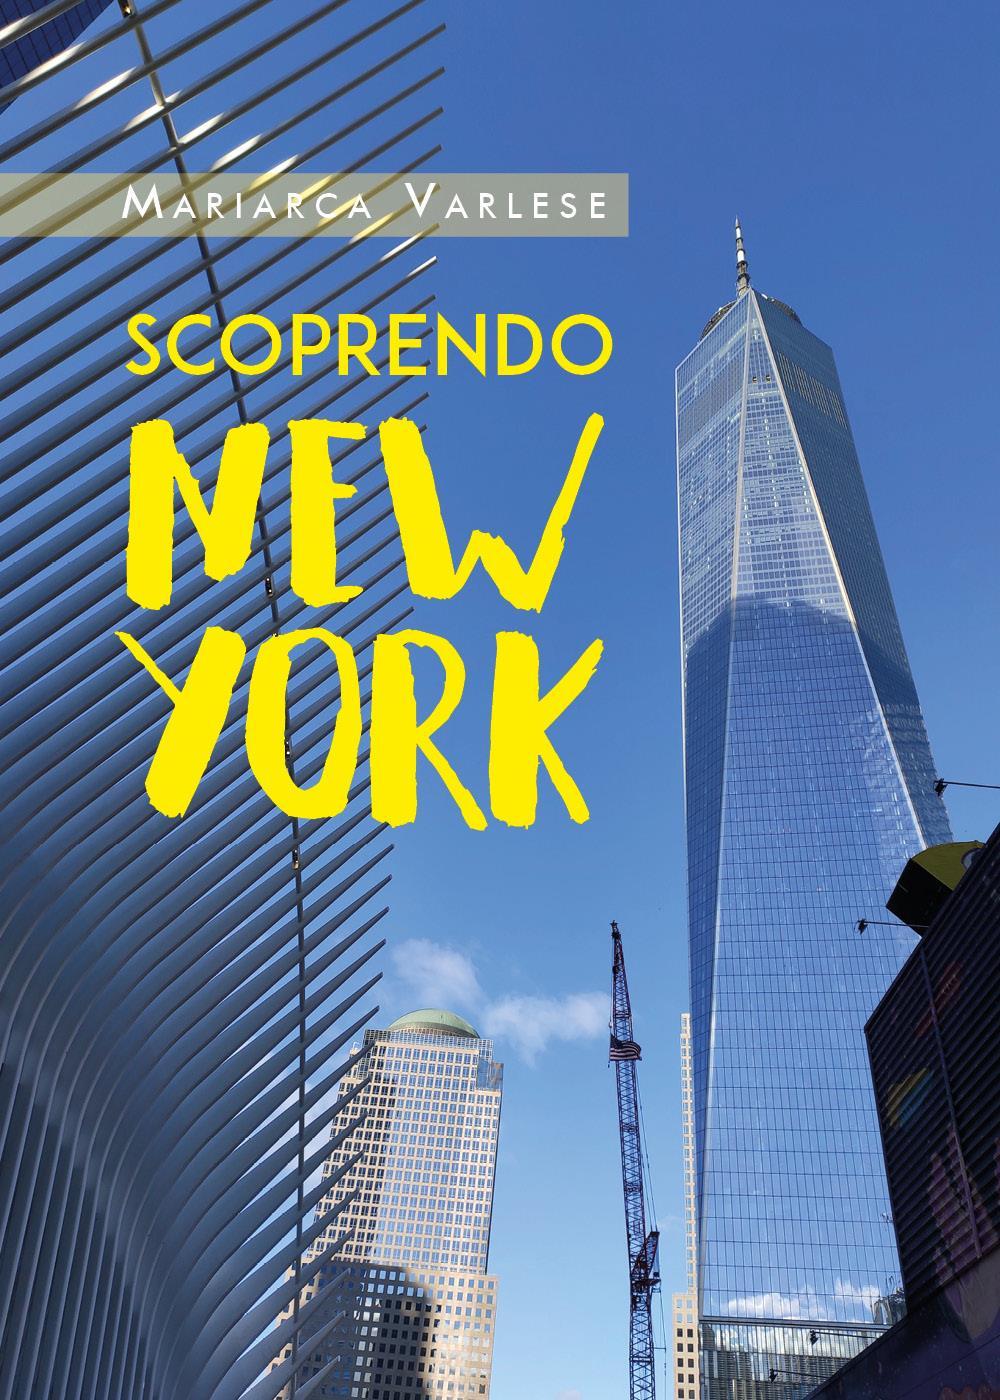 Scoprendo New York